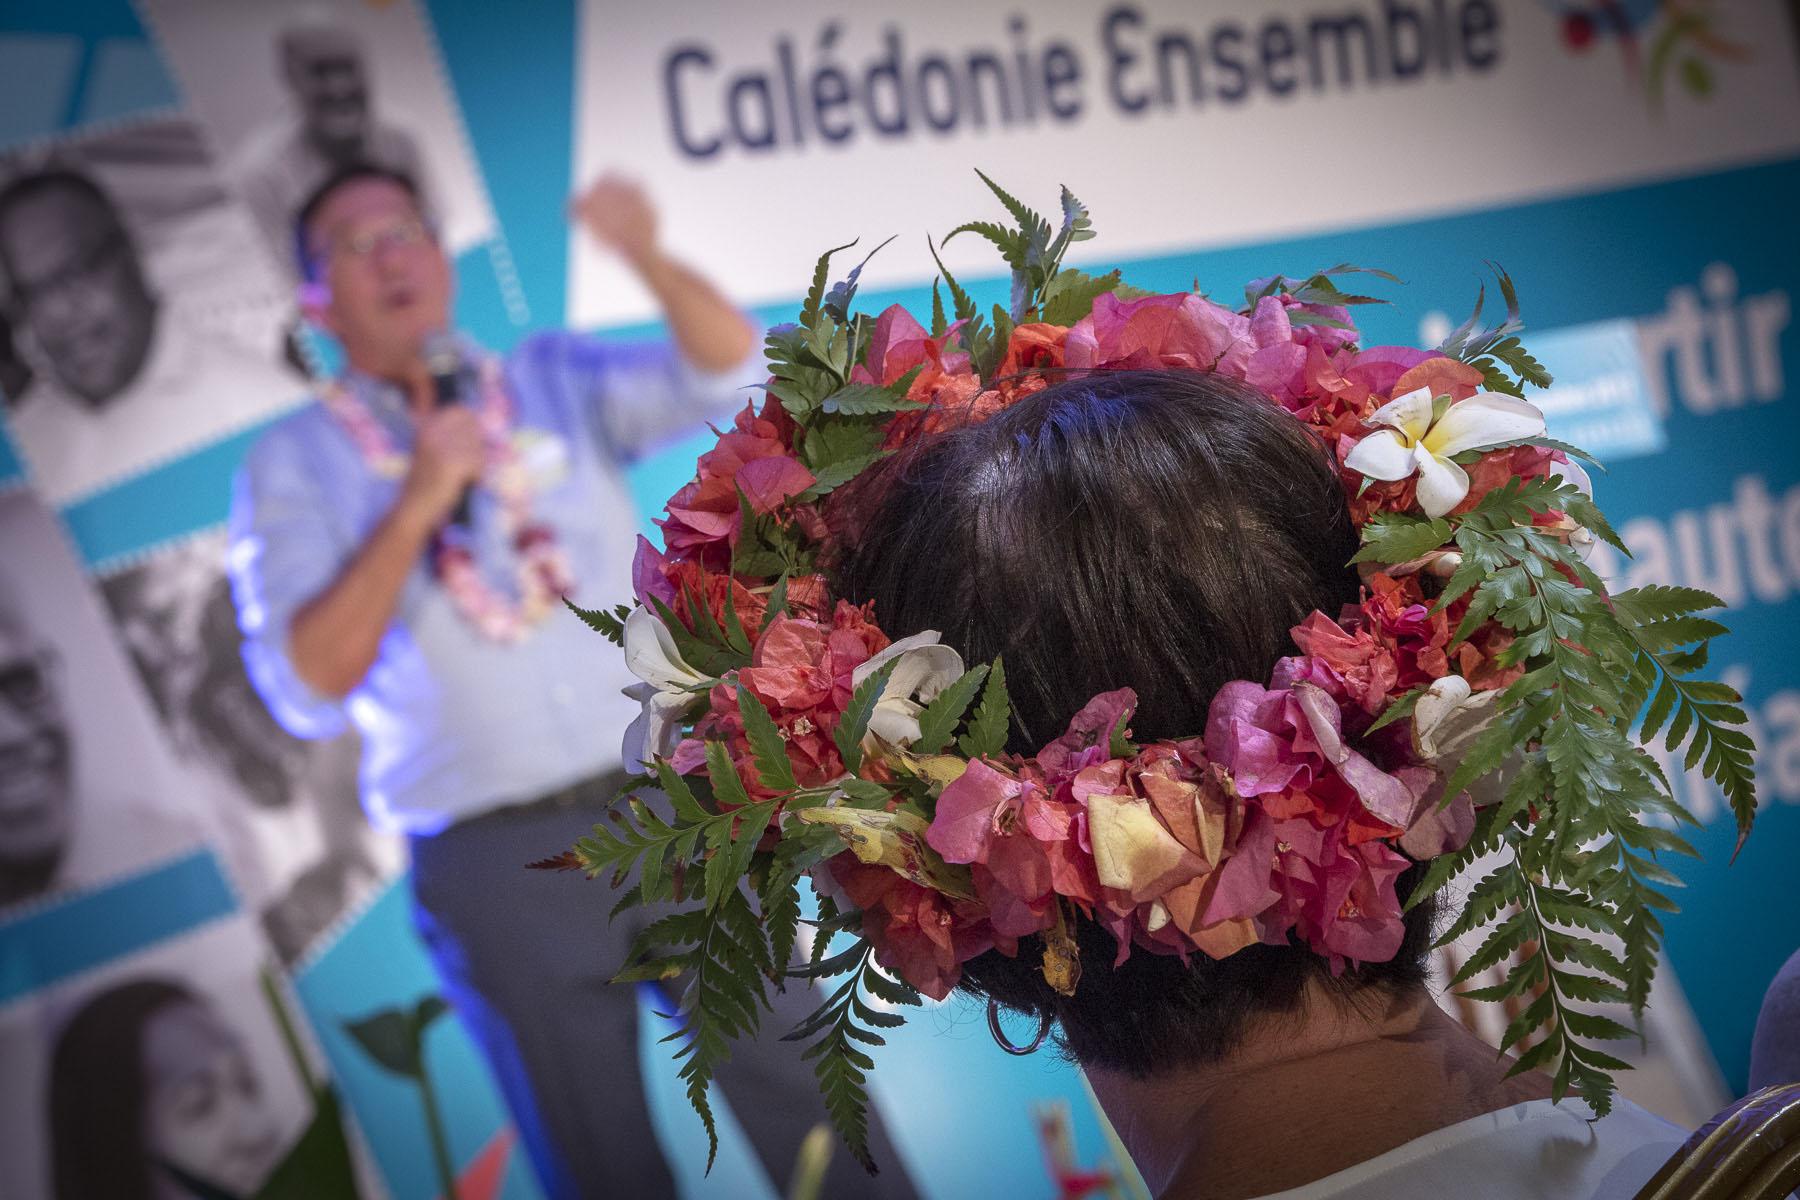 Party congress {quote}Calédonie Ensemble{quote} November 2017